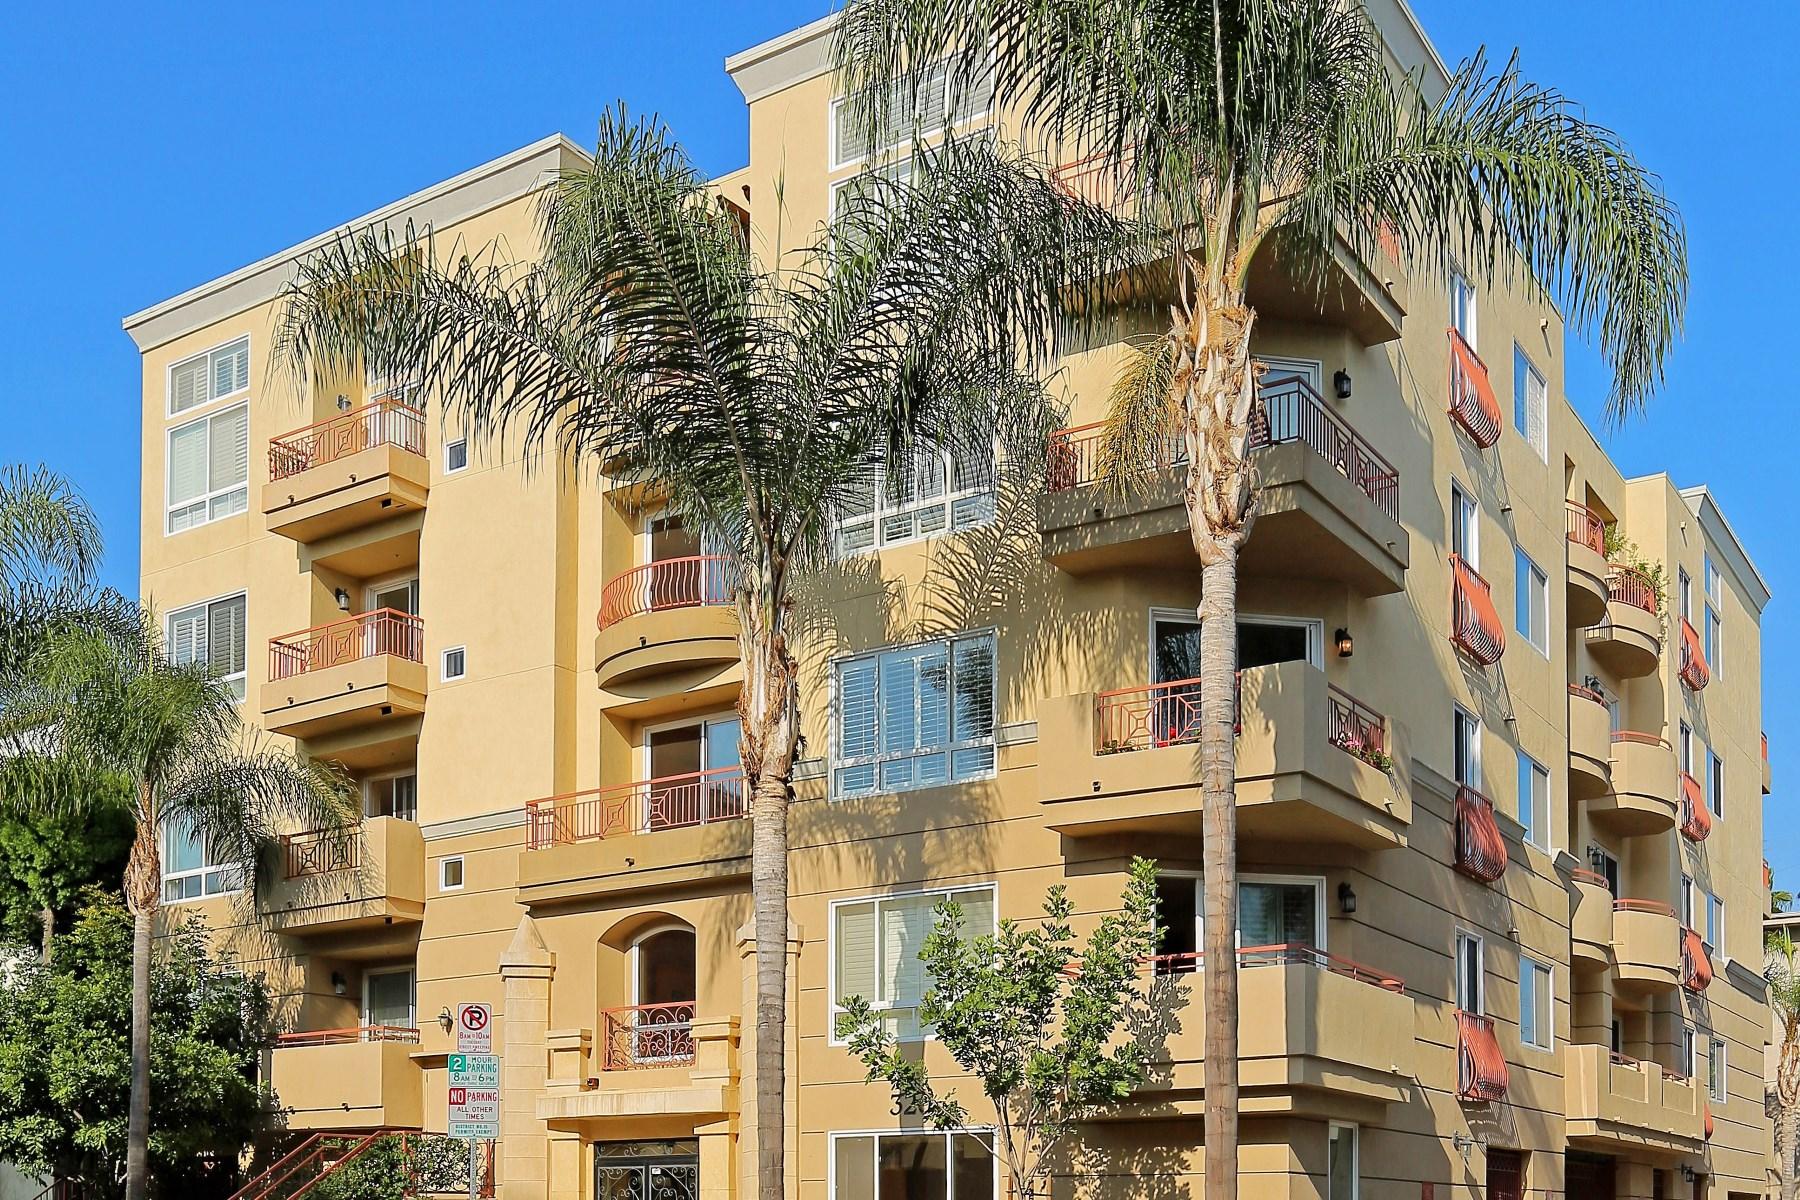 Condominium for Sale at Magnificent Mediterranean Condo 320 S Willaman Drive #304 Beverly Center, Los Angeles, California, 90048 United States